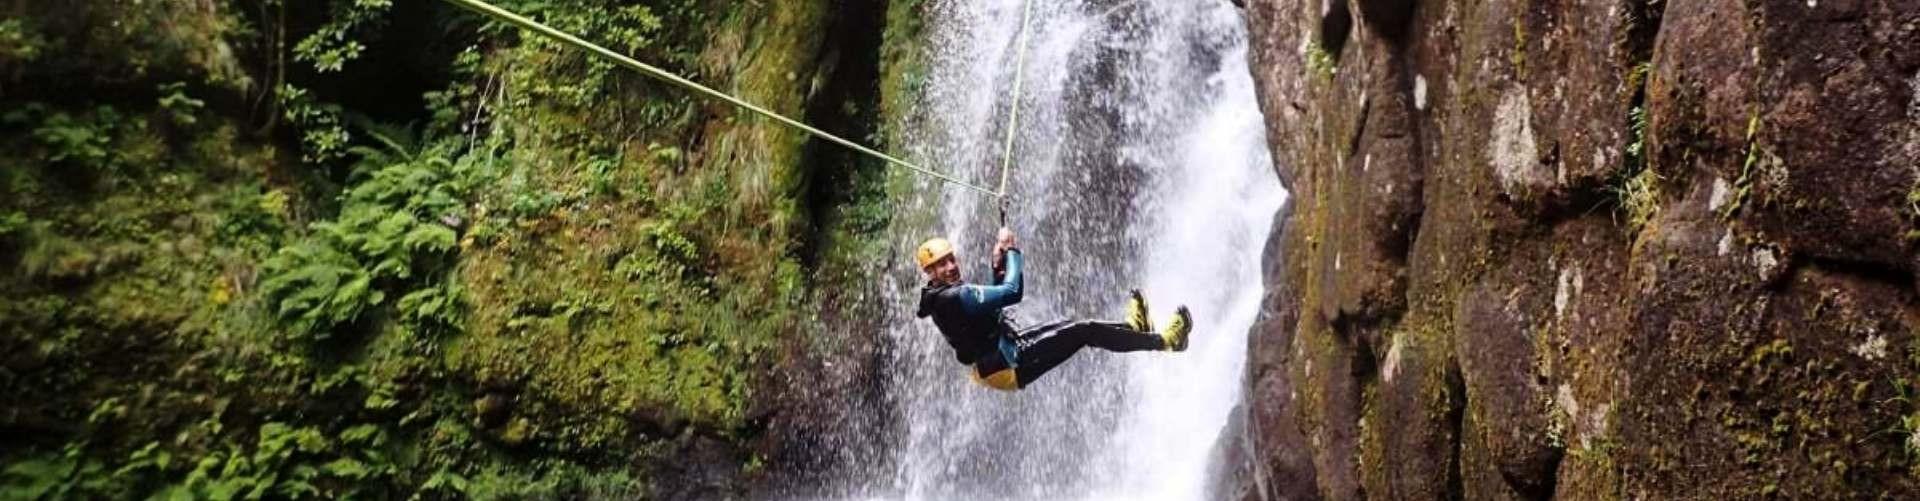 Madeira Canyoning in Ribeira do Lajeado Level 2